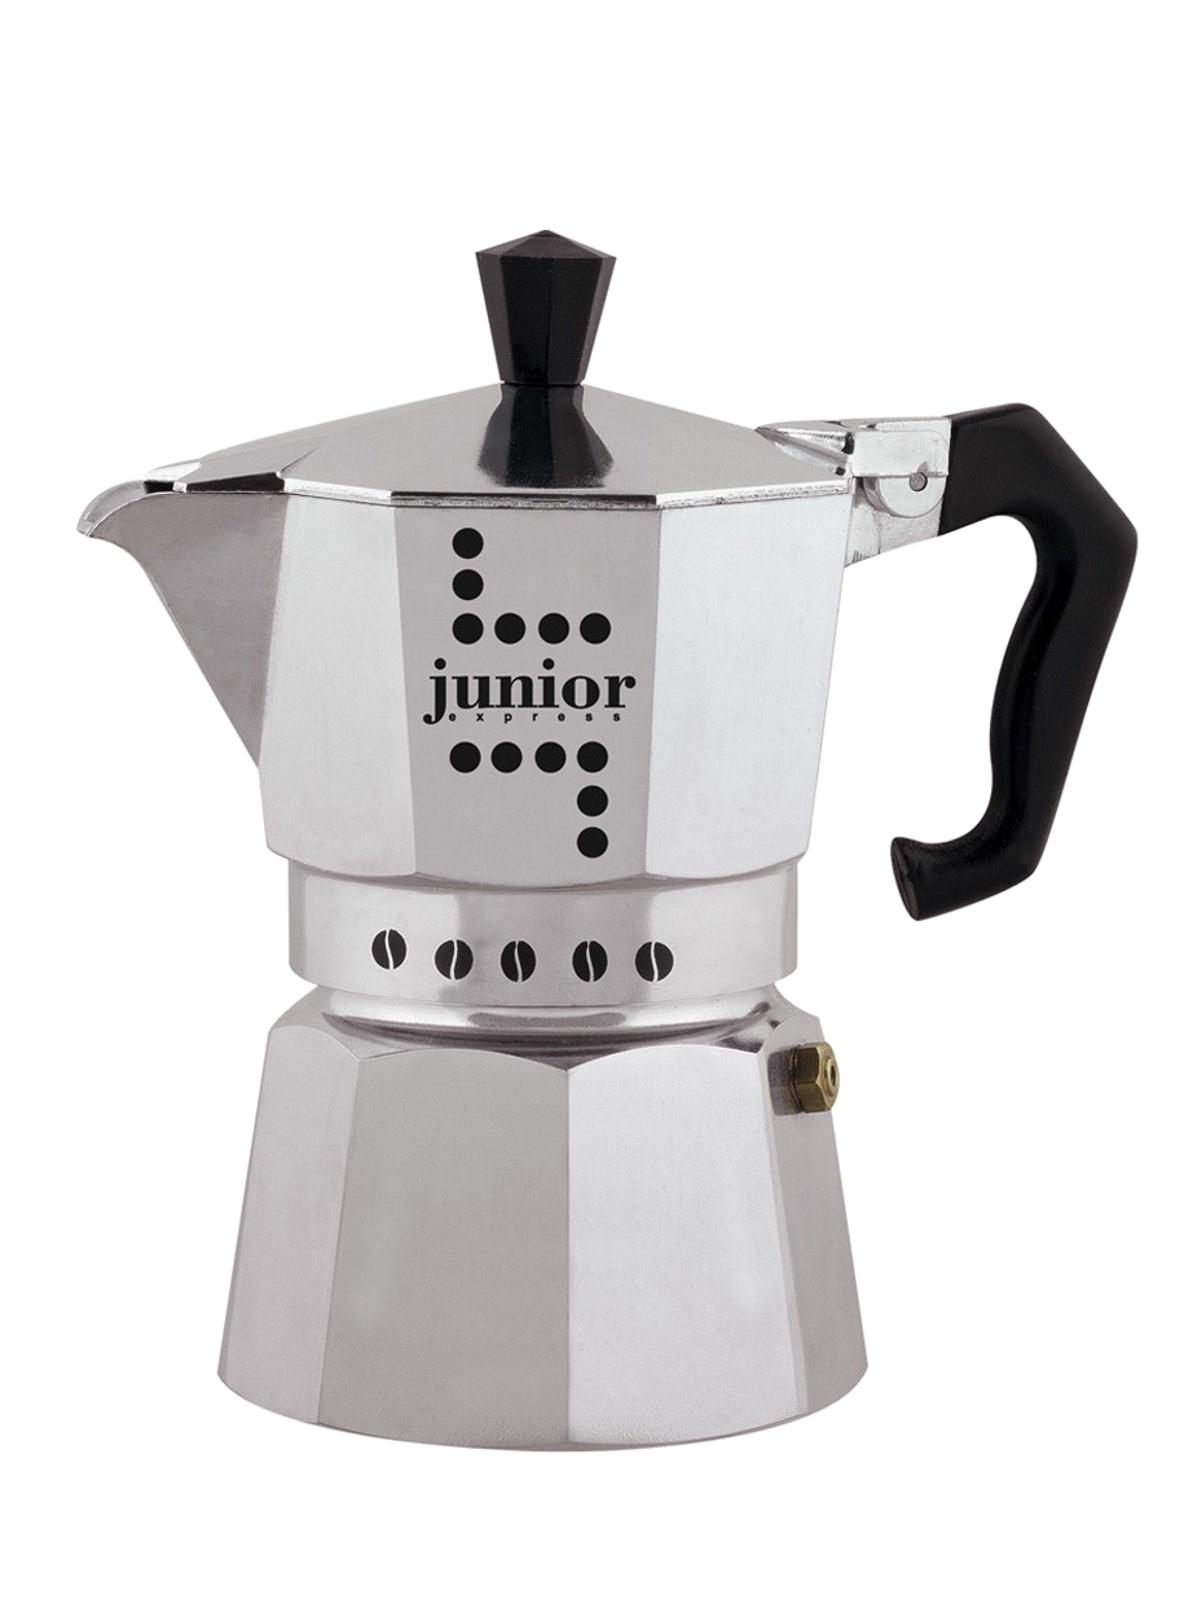 Кофеварка гейзерная Junior, на 3 порции кофеварка гейзерная bialetti fiametta 3 порции алюминий 4632